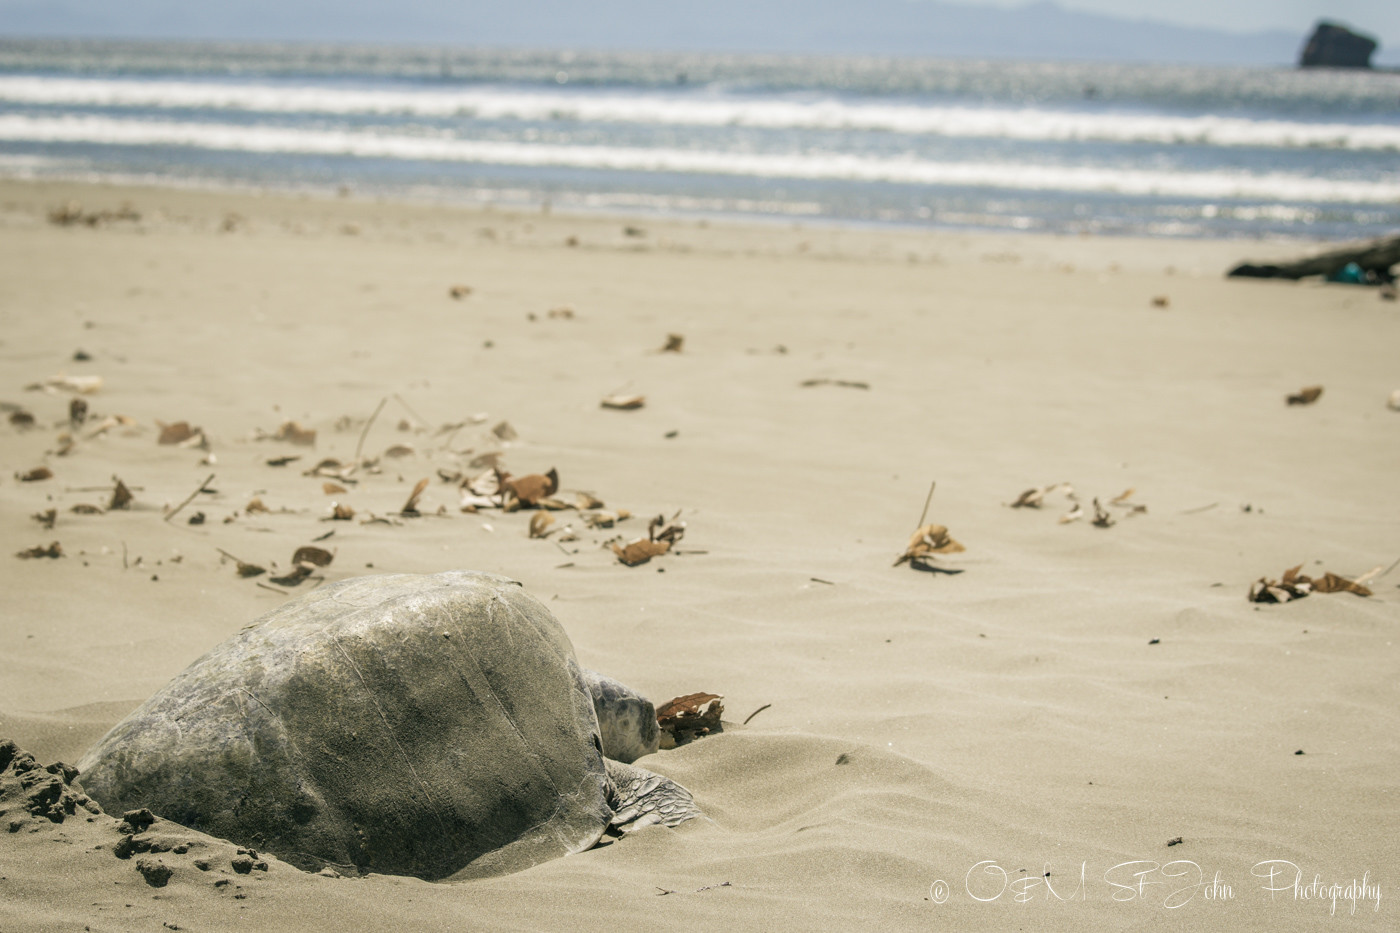 Turtle watching...Turtle laying eggs on Playa Hermosa, San Juan del Sur, Nicaragua